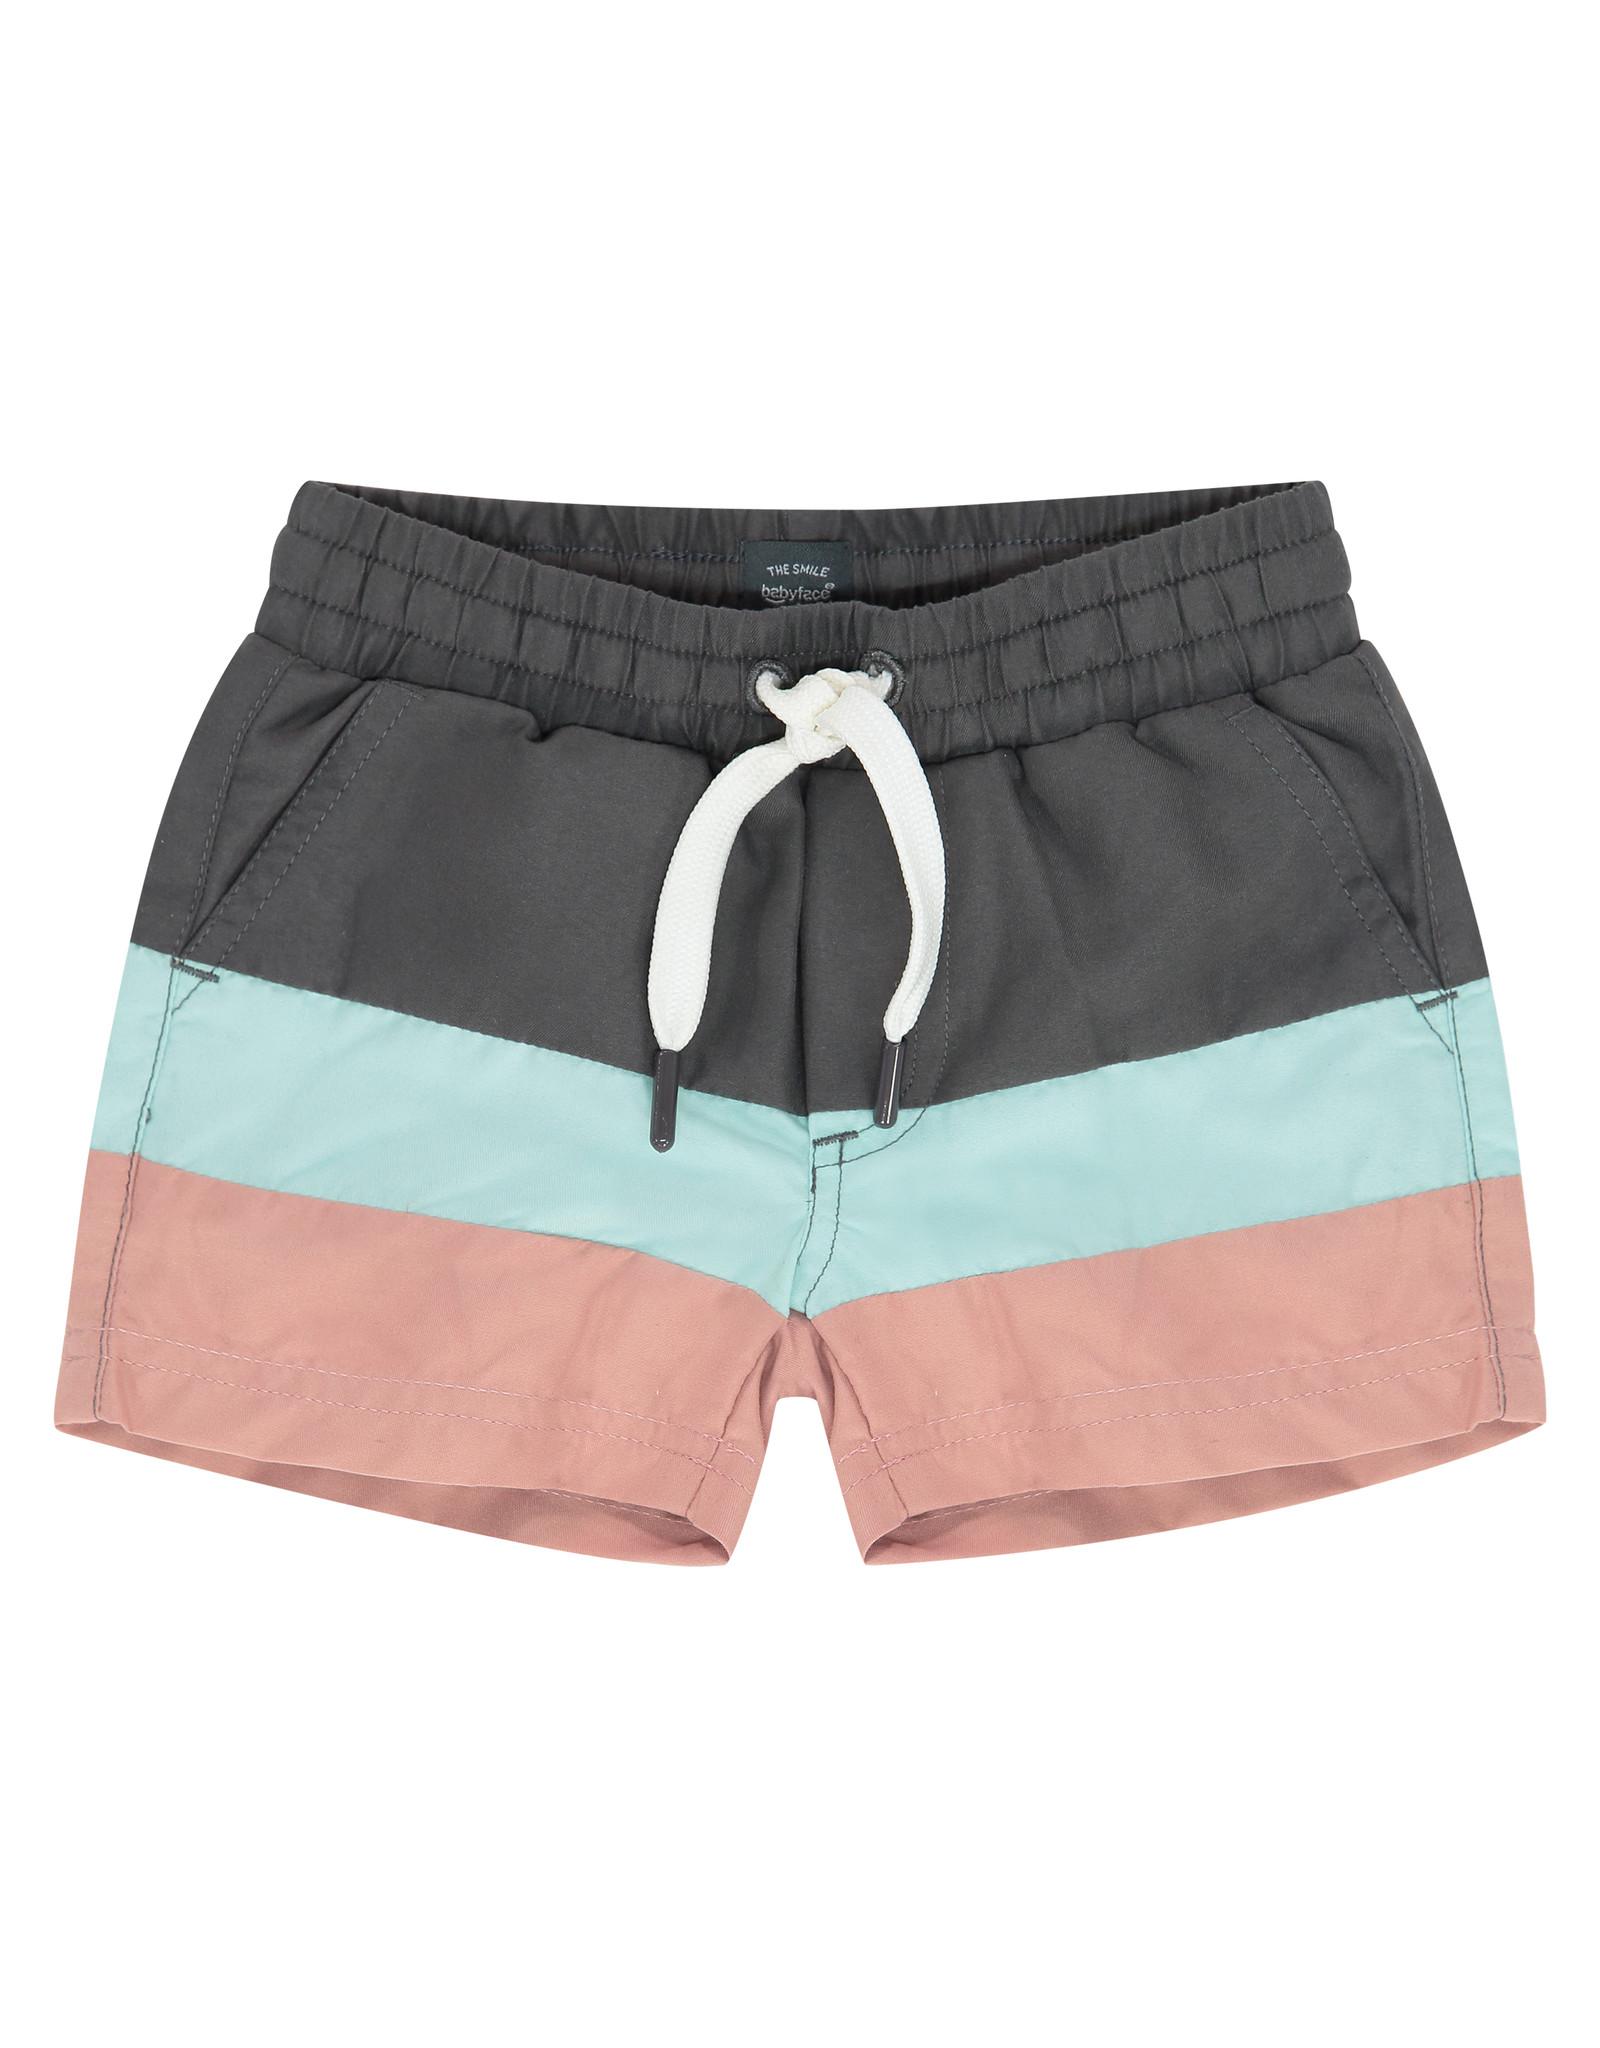 Babyface boys swim short, antra, BBE21207253